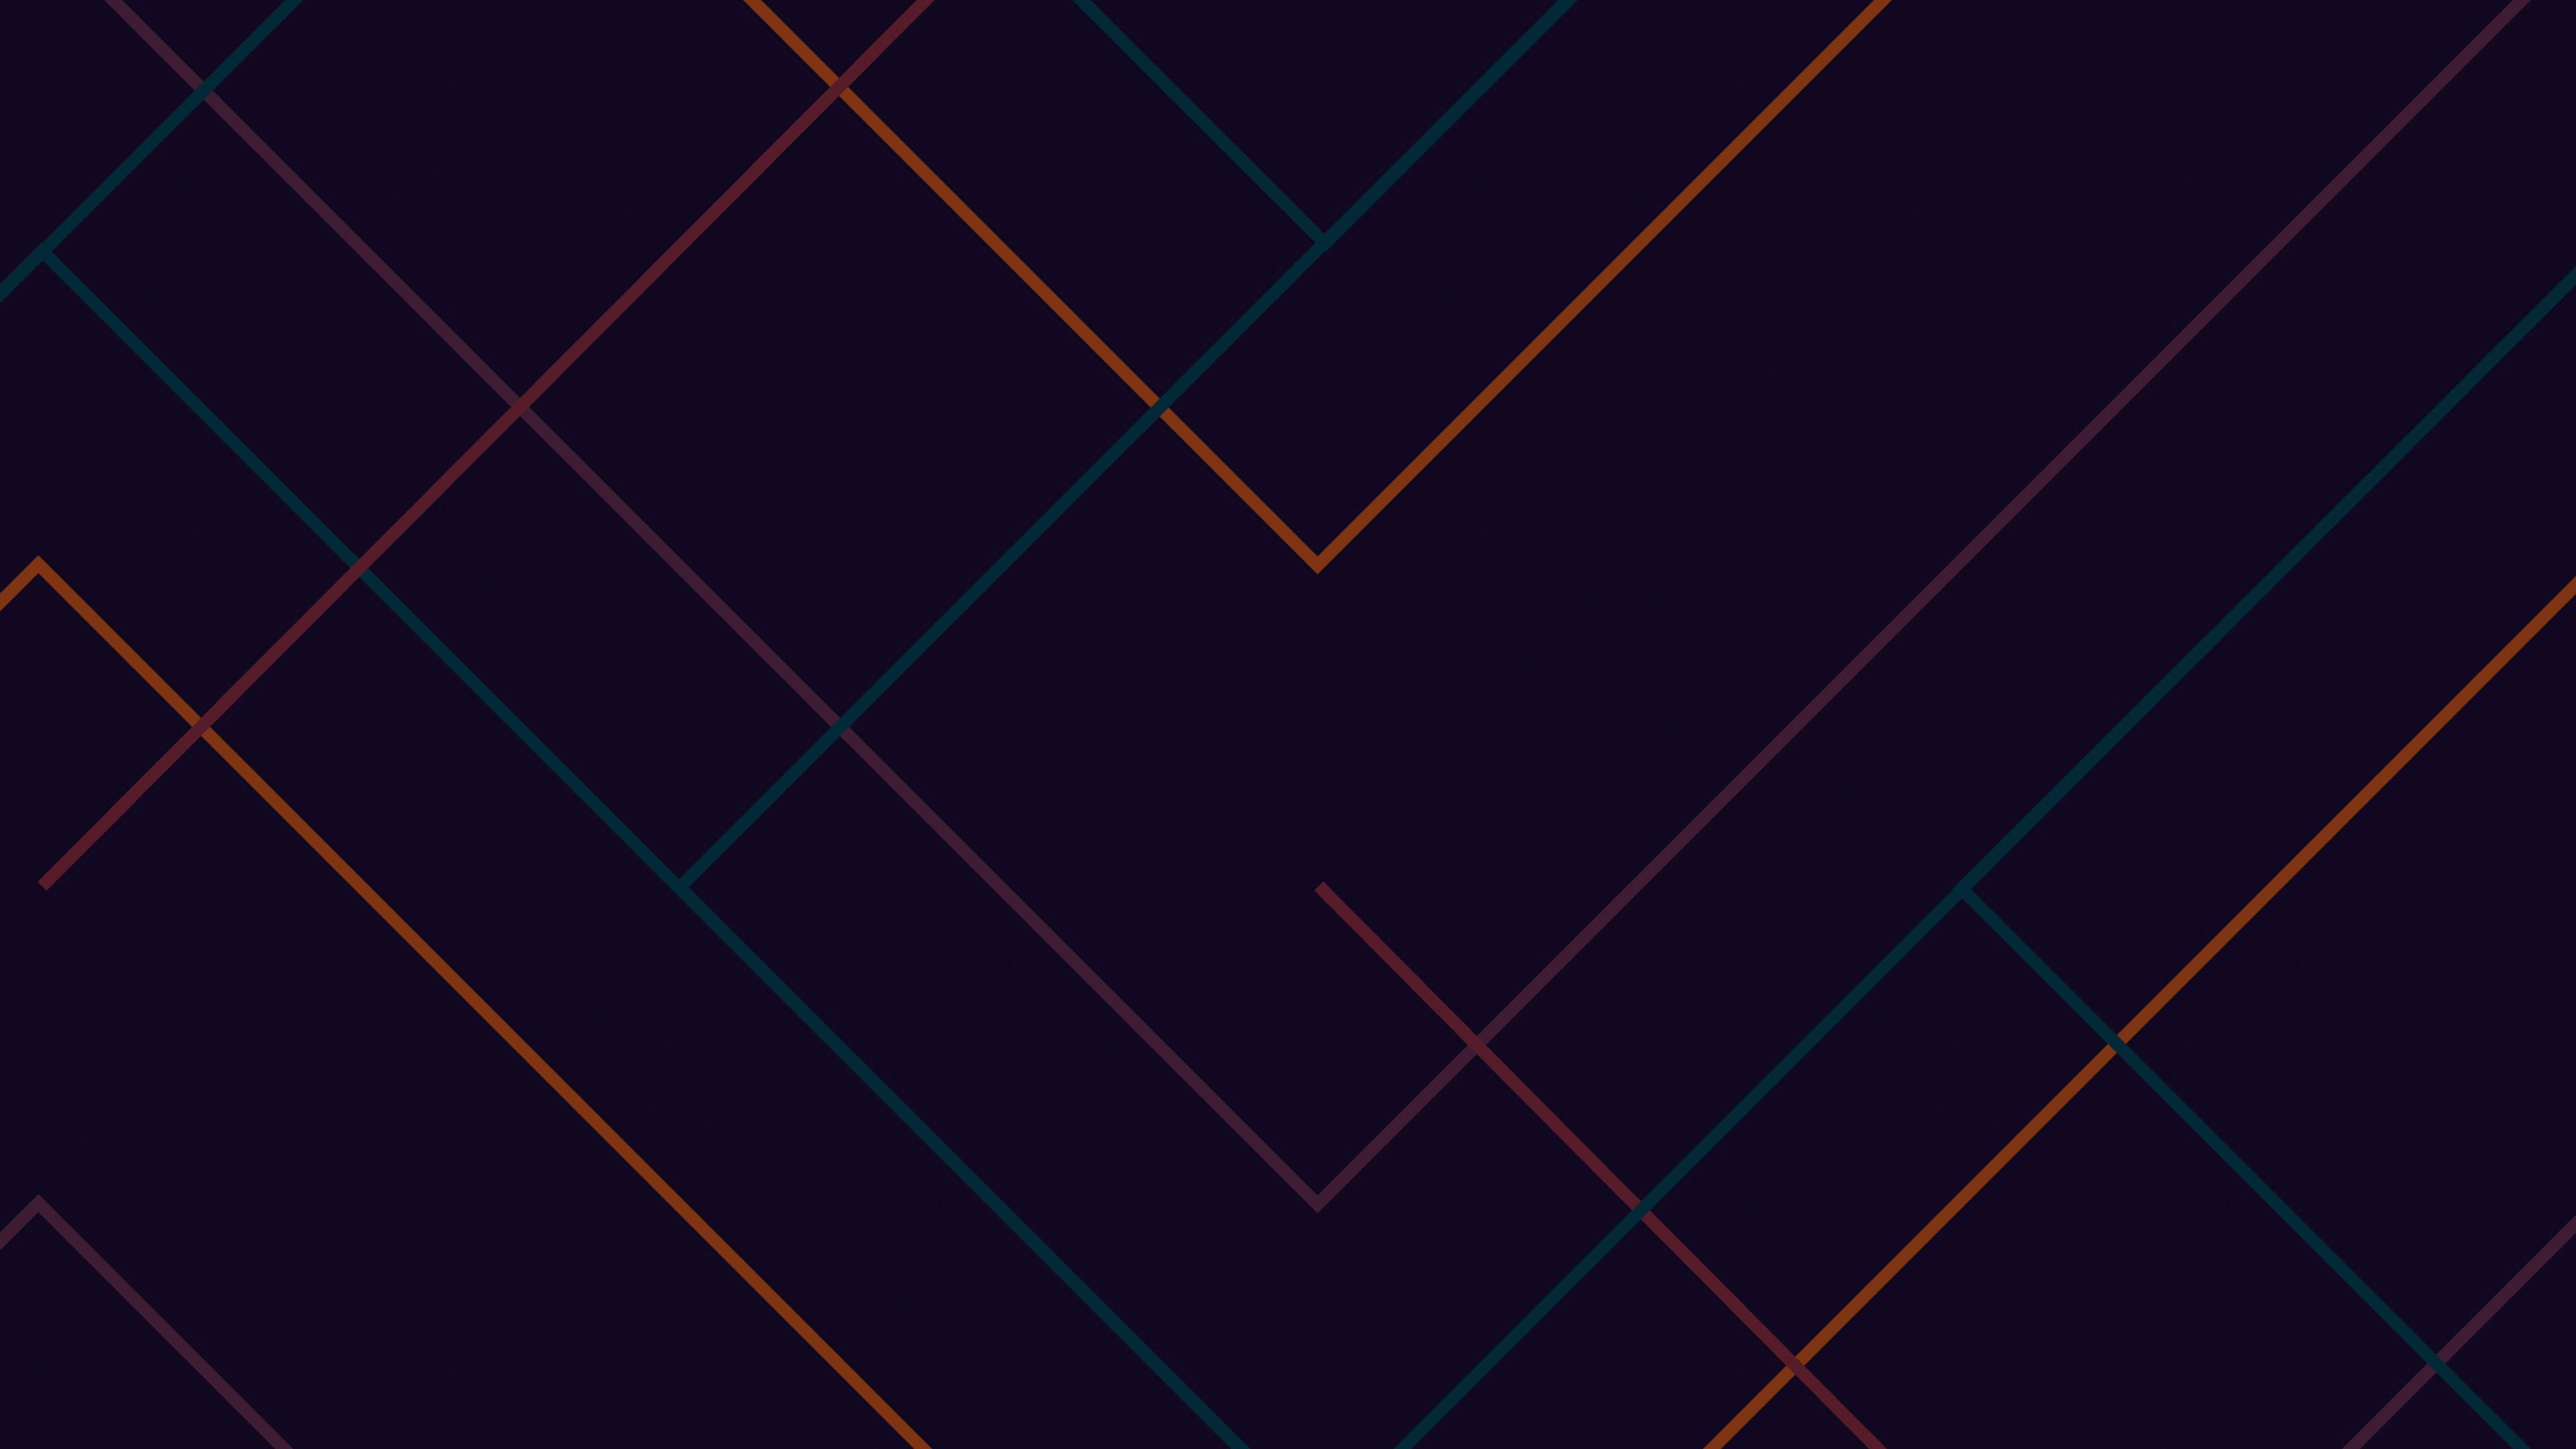 Dark Geometric Wallpaper 4k